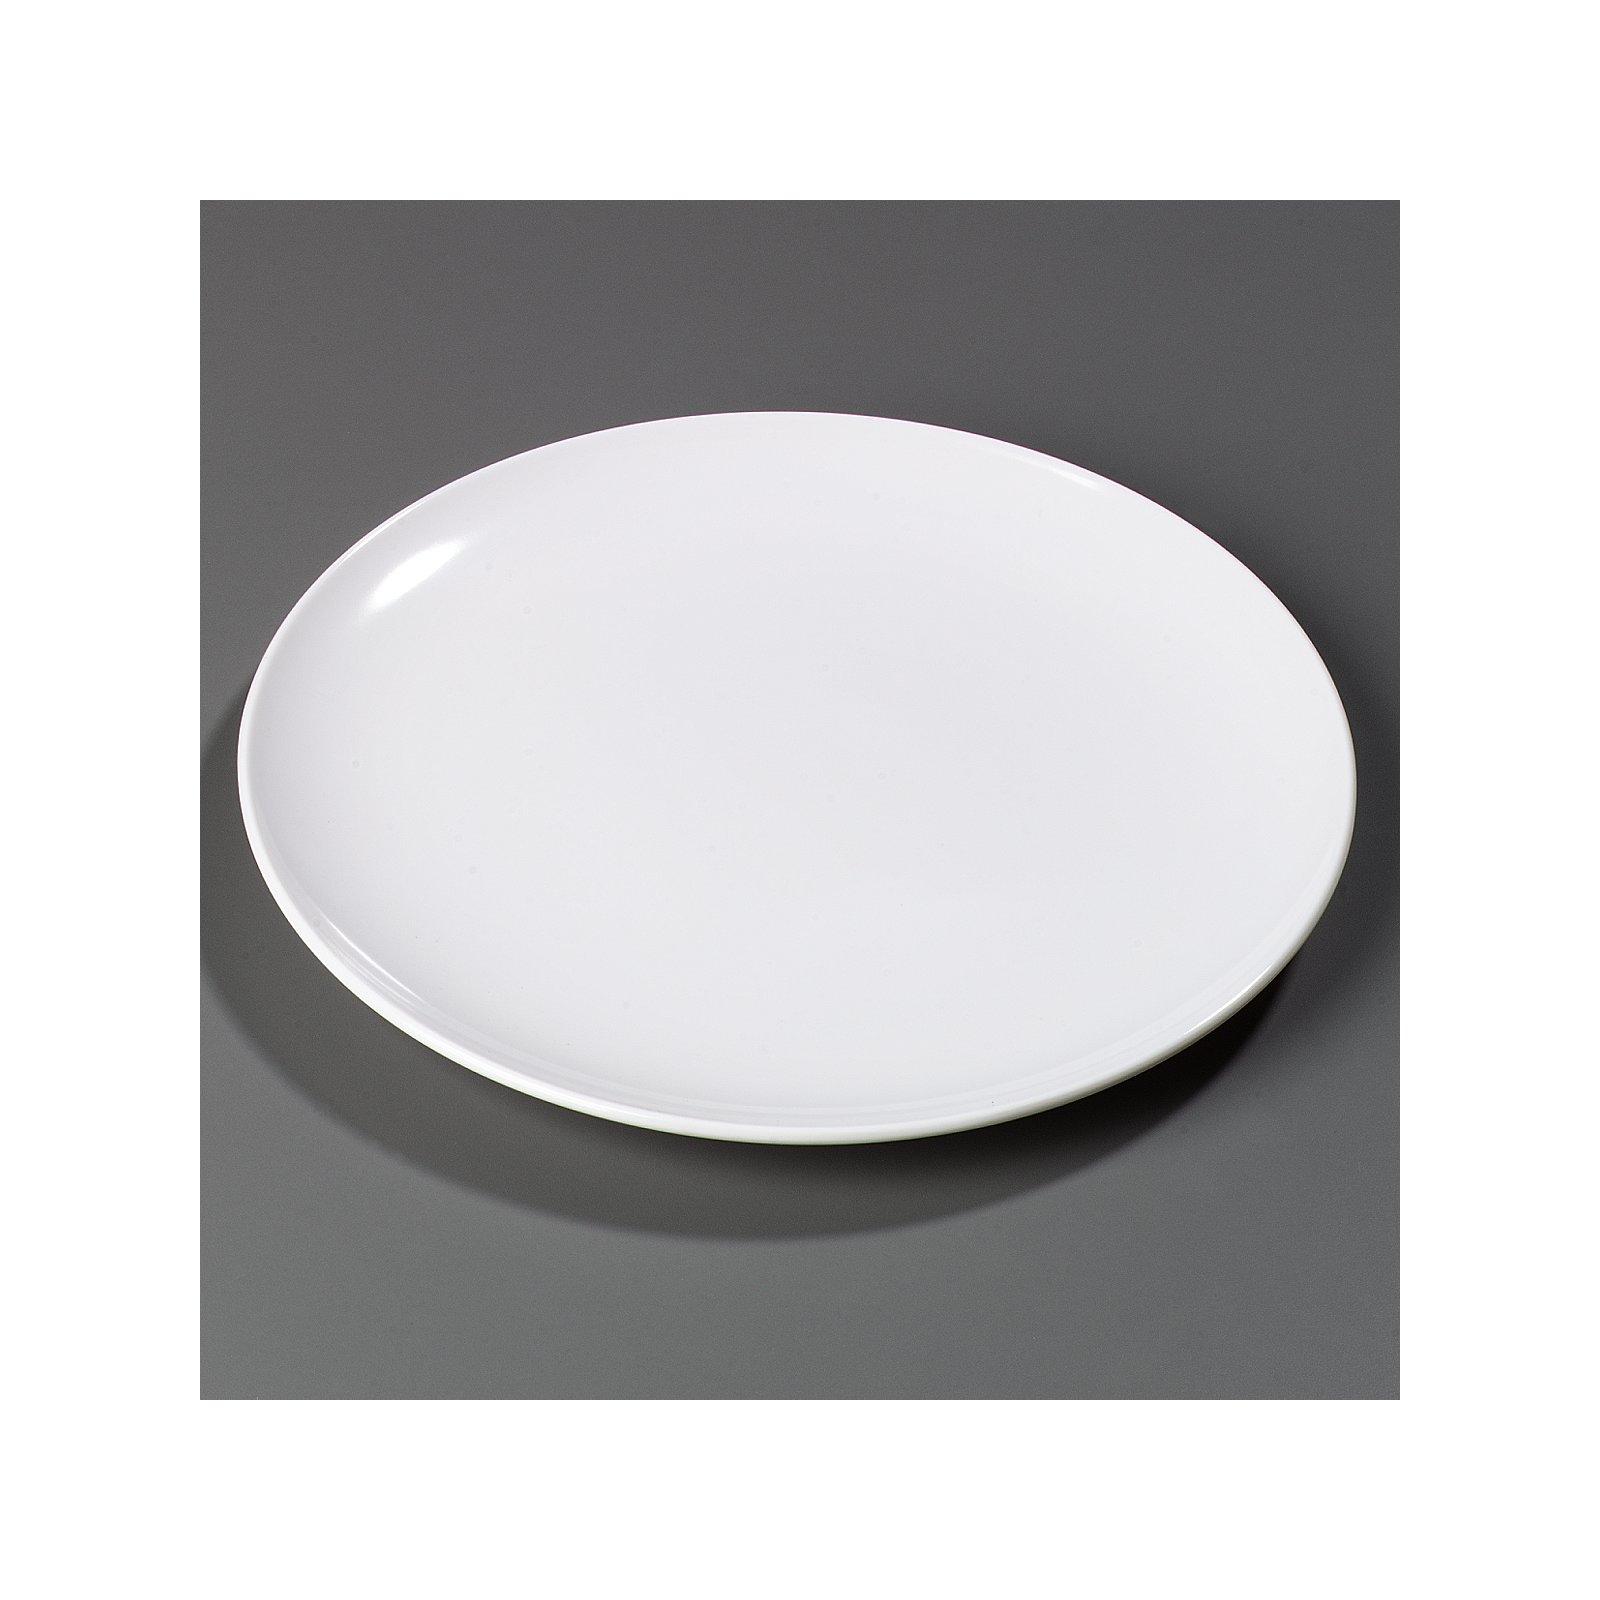 4380002 - Epicure® Melamine Buffet Pizza Plate 12  - White  sc 1 st  Carlisle FoodService Products & 4380002 - Epicure® Melamine Buffet Pizza Plate 12